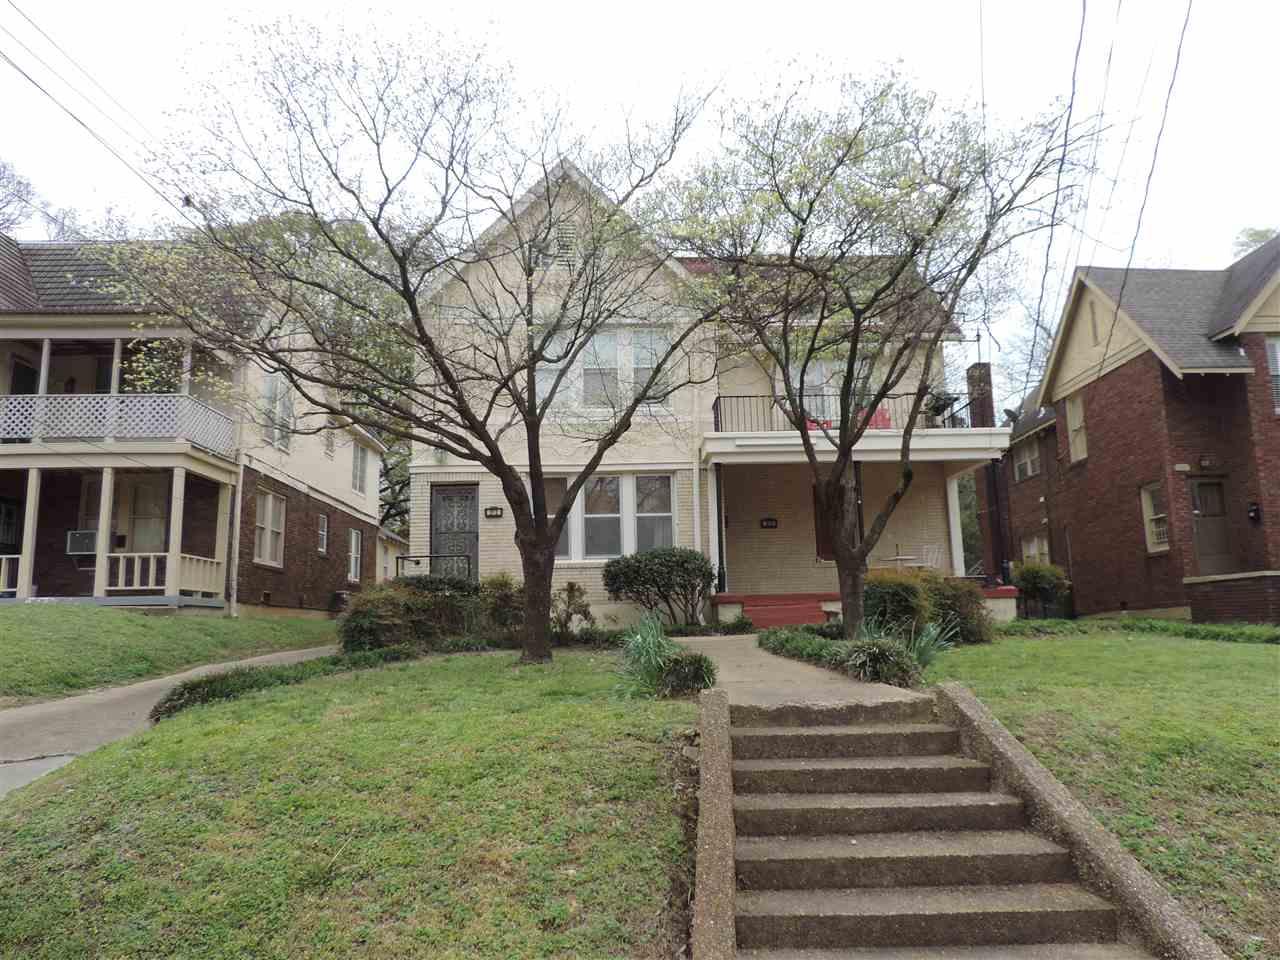 270 HAWTHORNE ST, Memphis, TN 38112